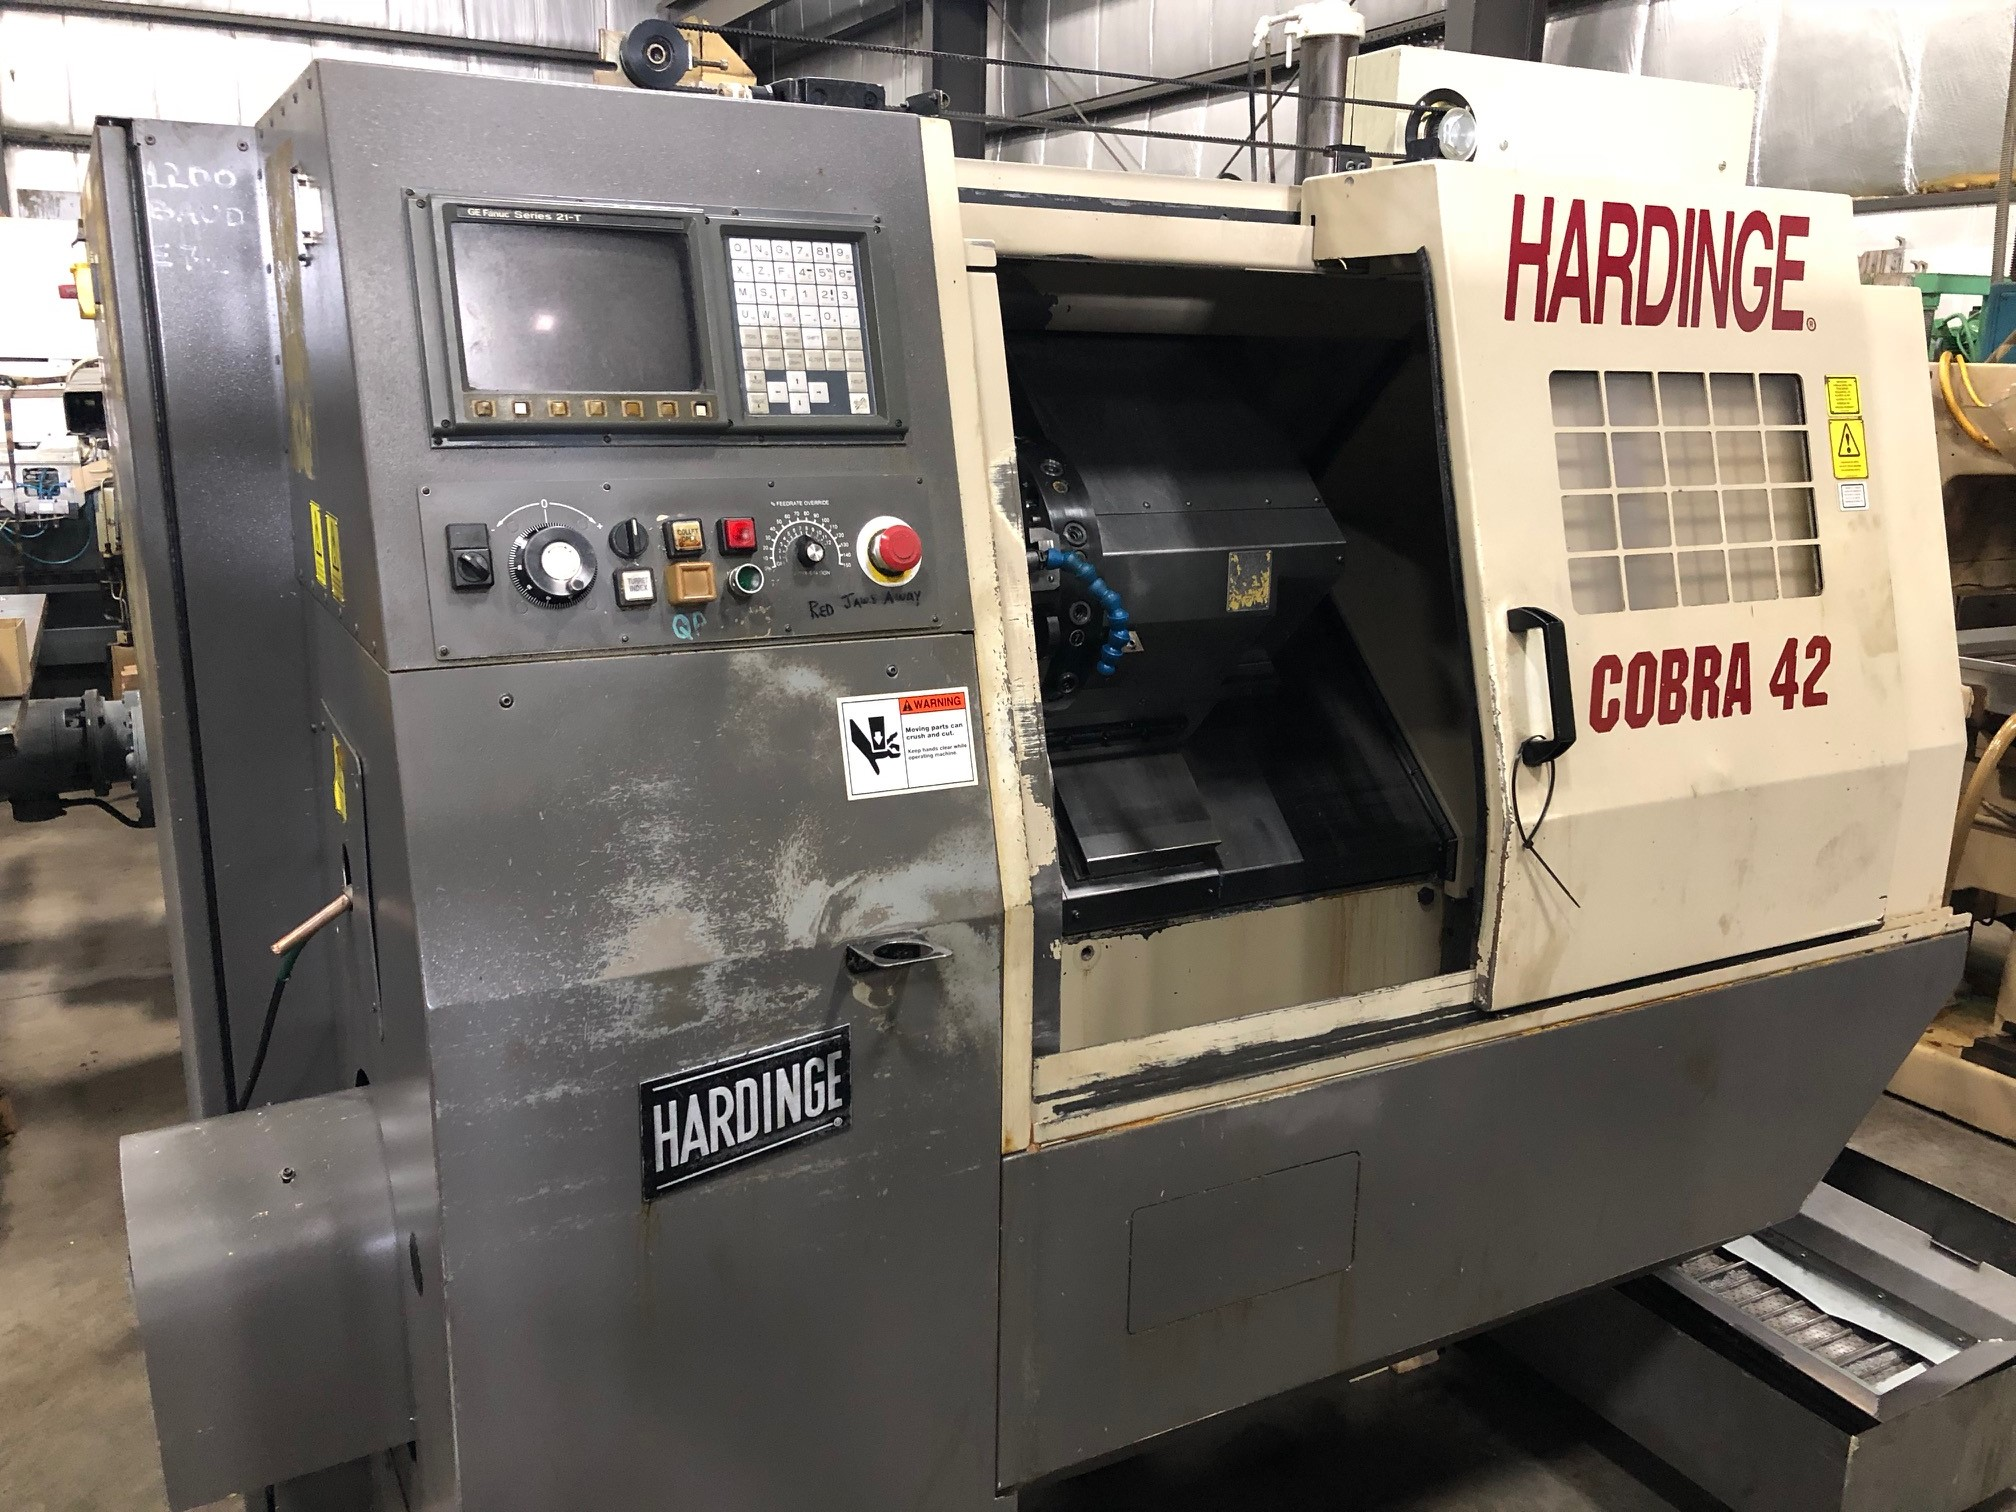 HARDINGE COBRA 42 , FANUC 21T CONTROL, CHIP CONVEYOR, TURRET, CHUCKER, 5000 RPM, 1997